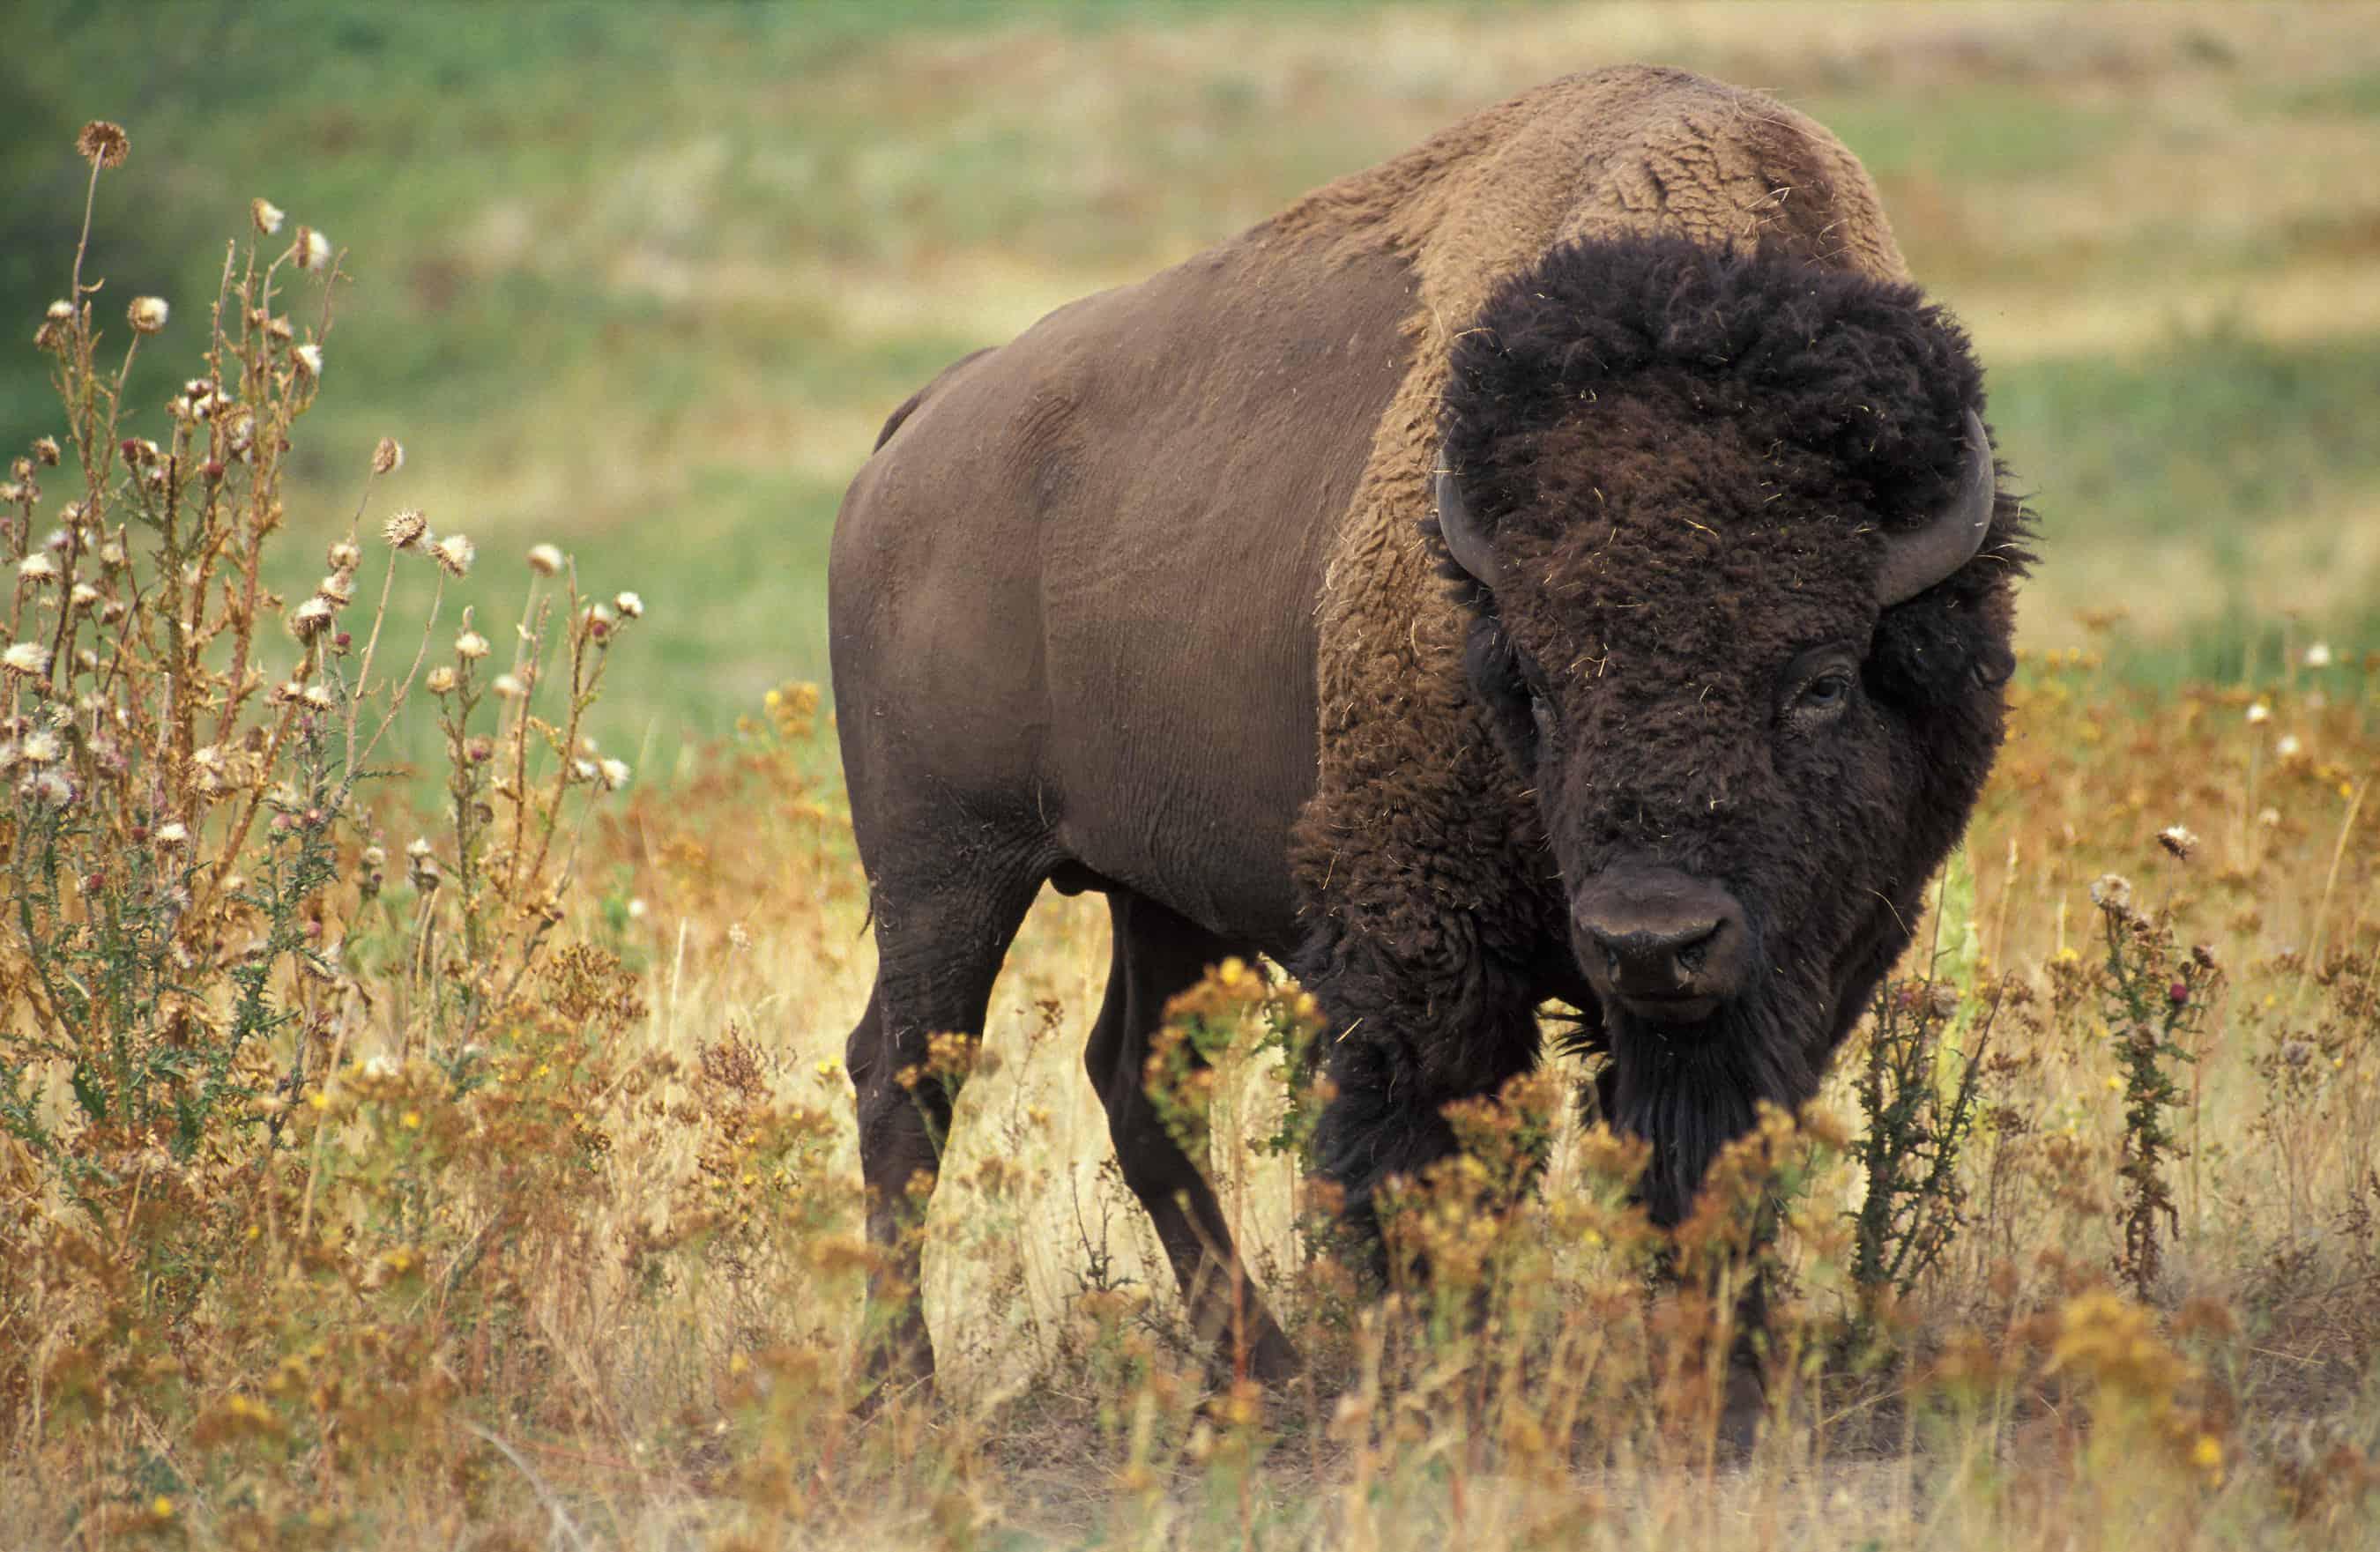 How big is a Bison?